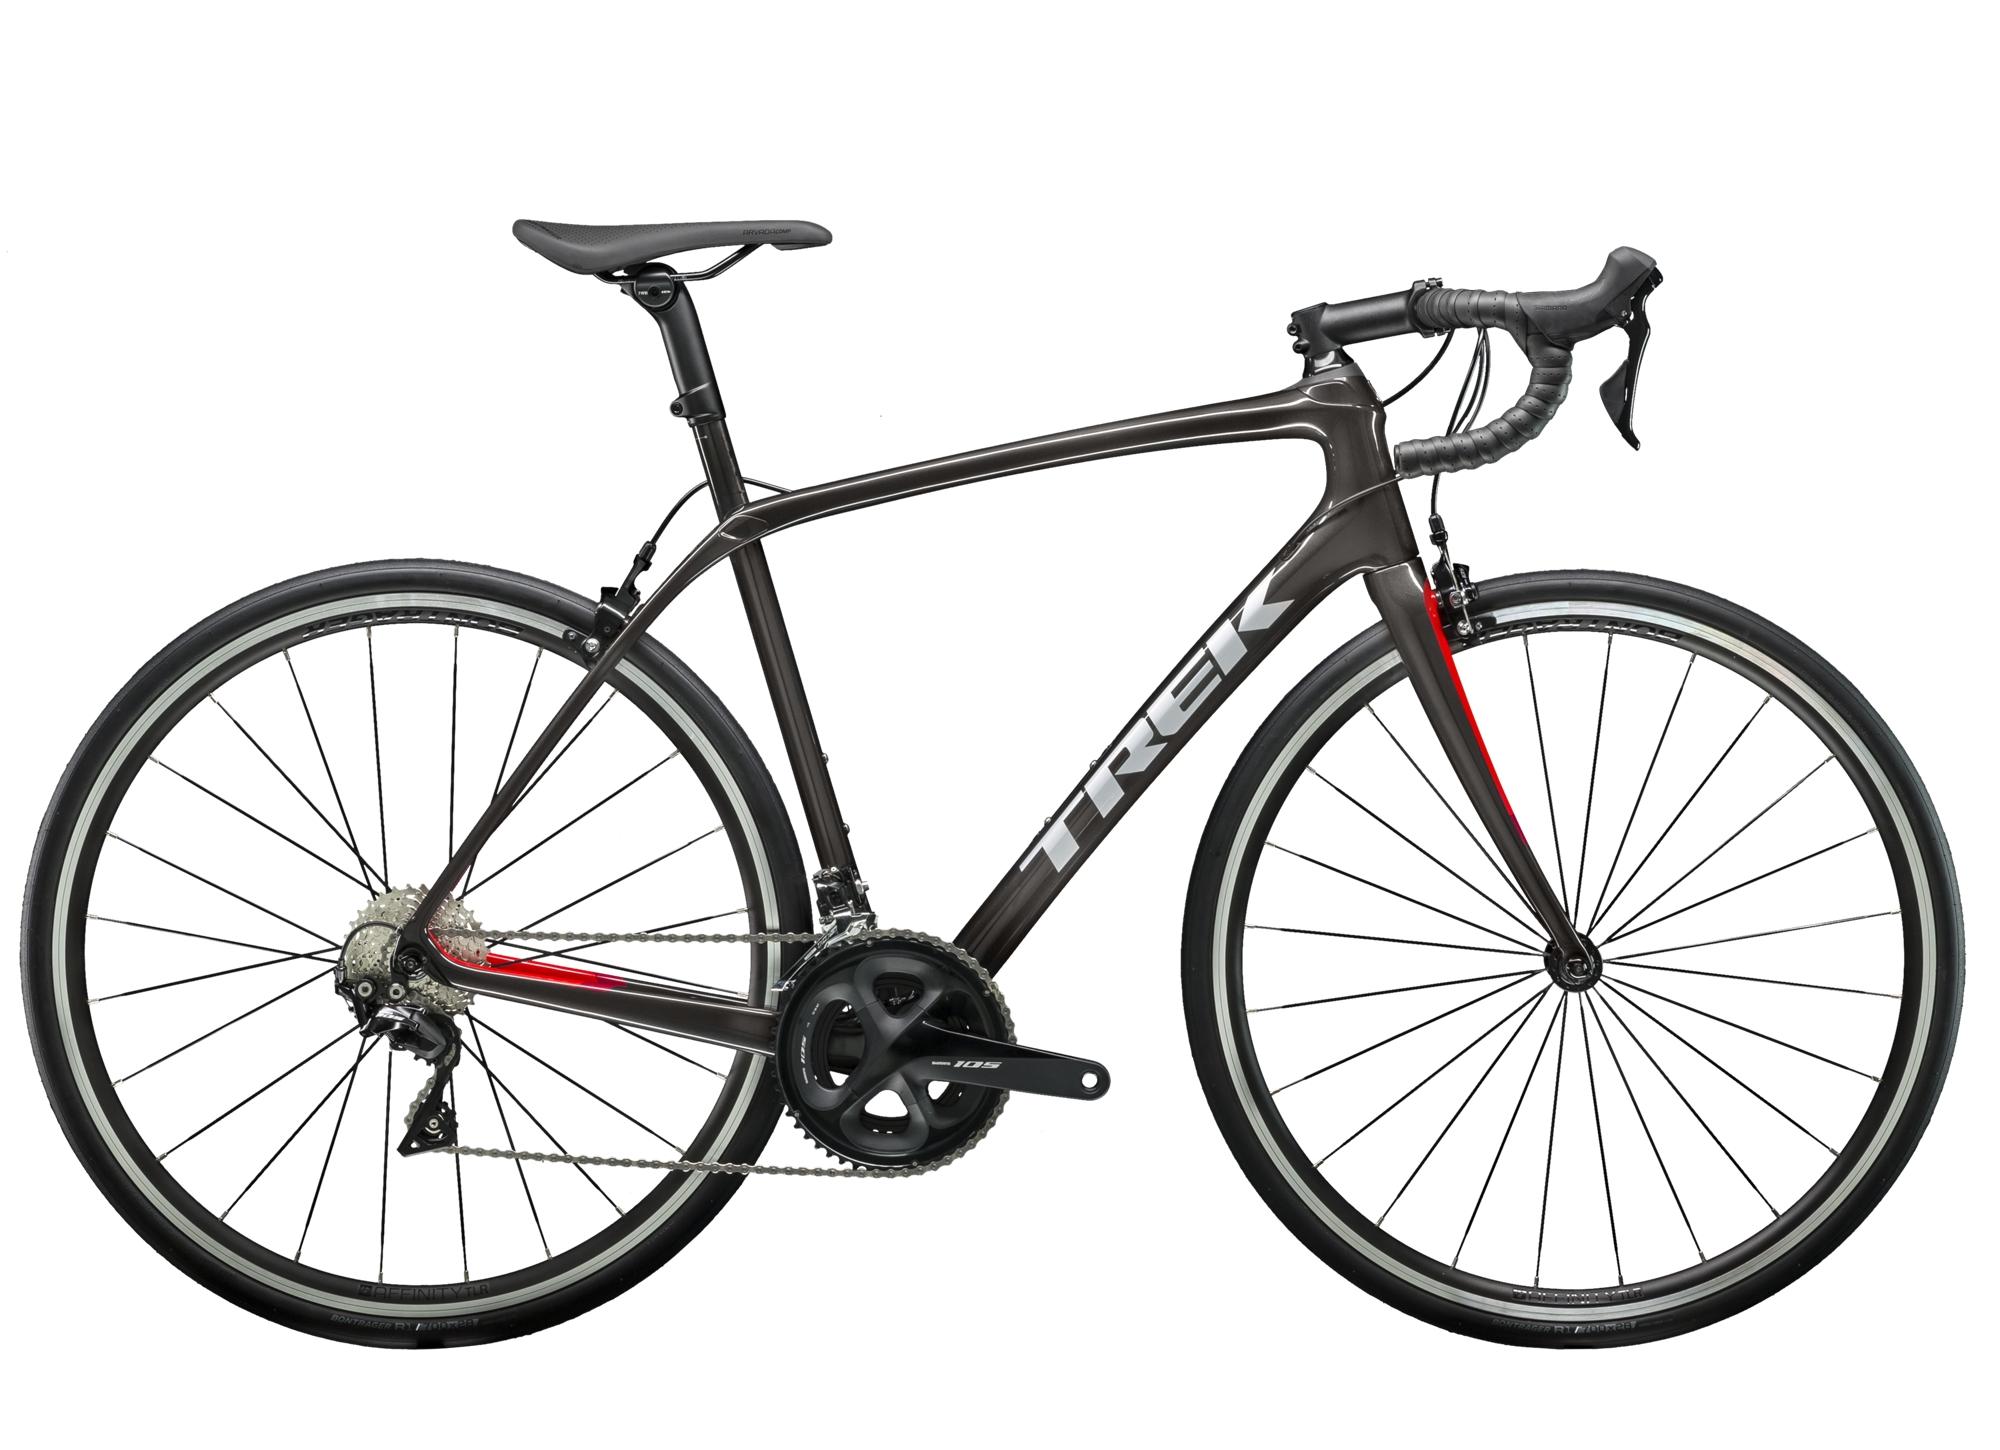 Carbon Road Bikes Trek Bikes >> 2019 Trek Domane Sl 5 Mens Carbon Road Bike In Grey 2 000 00